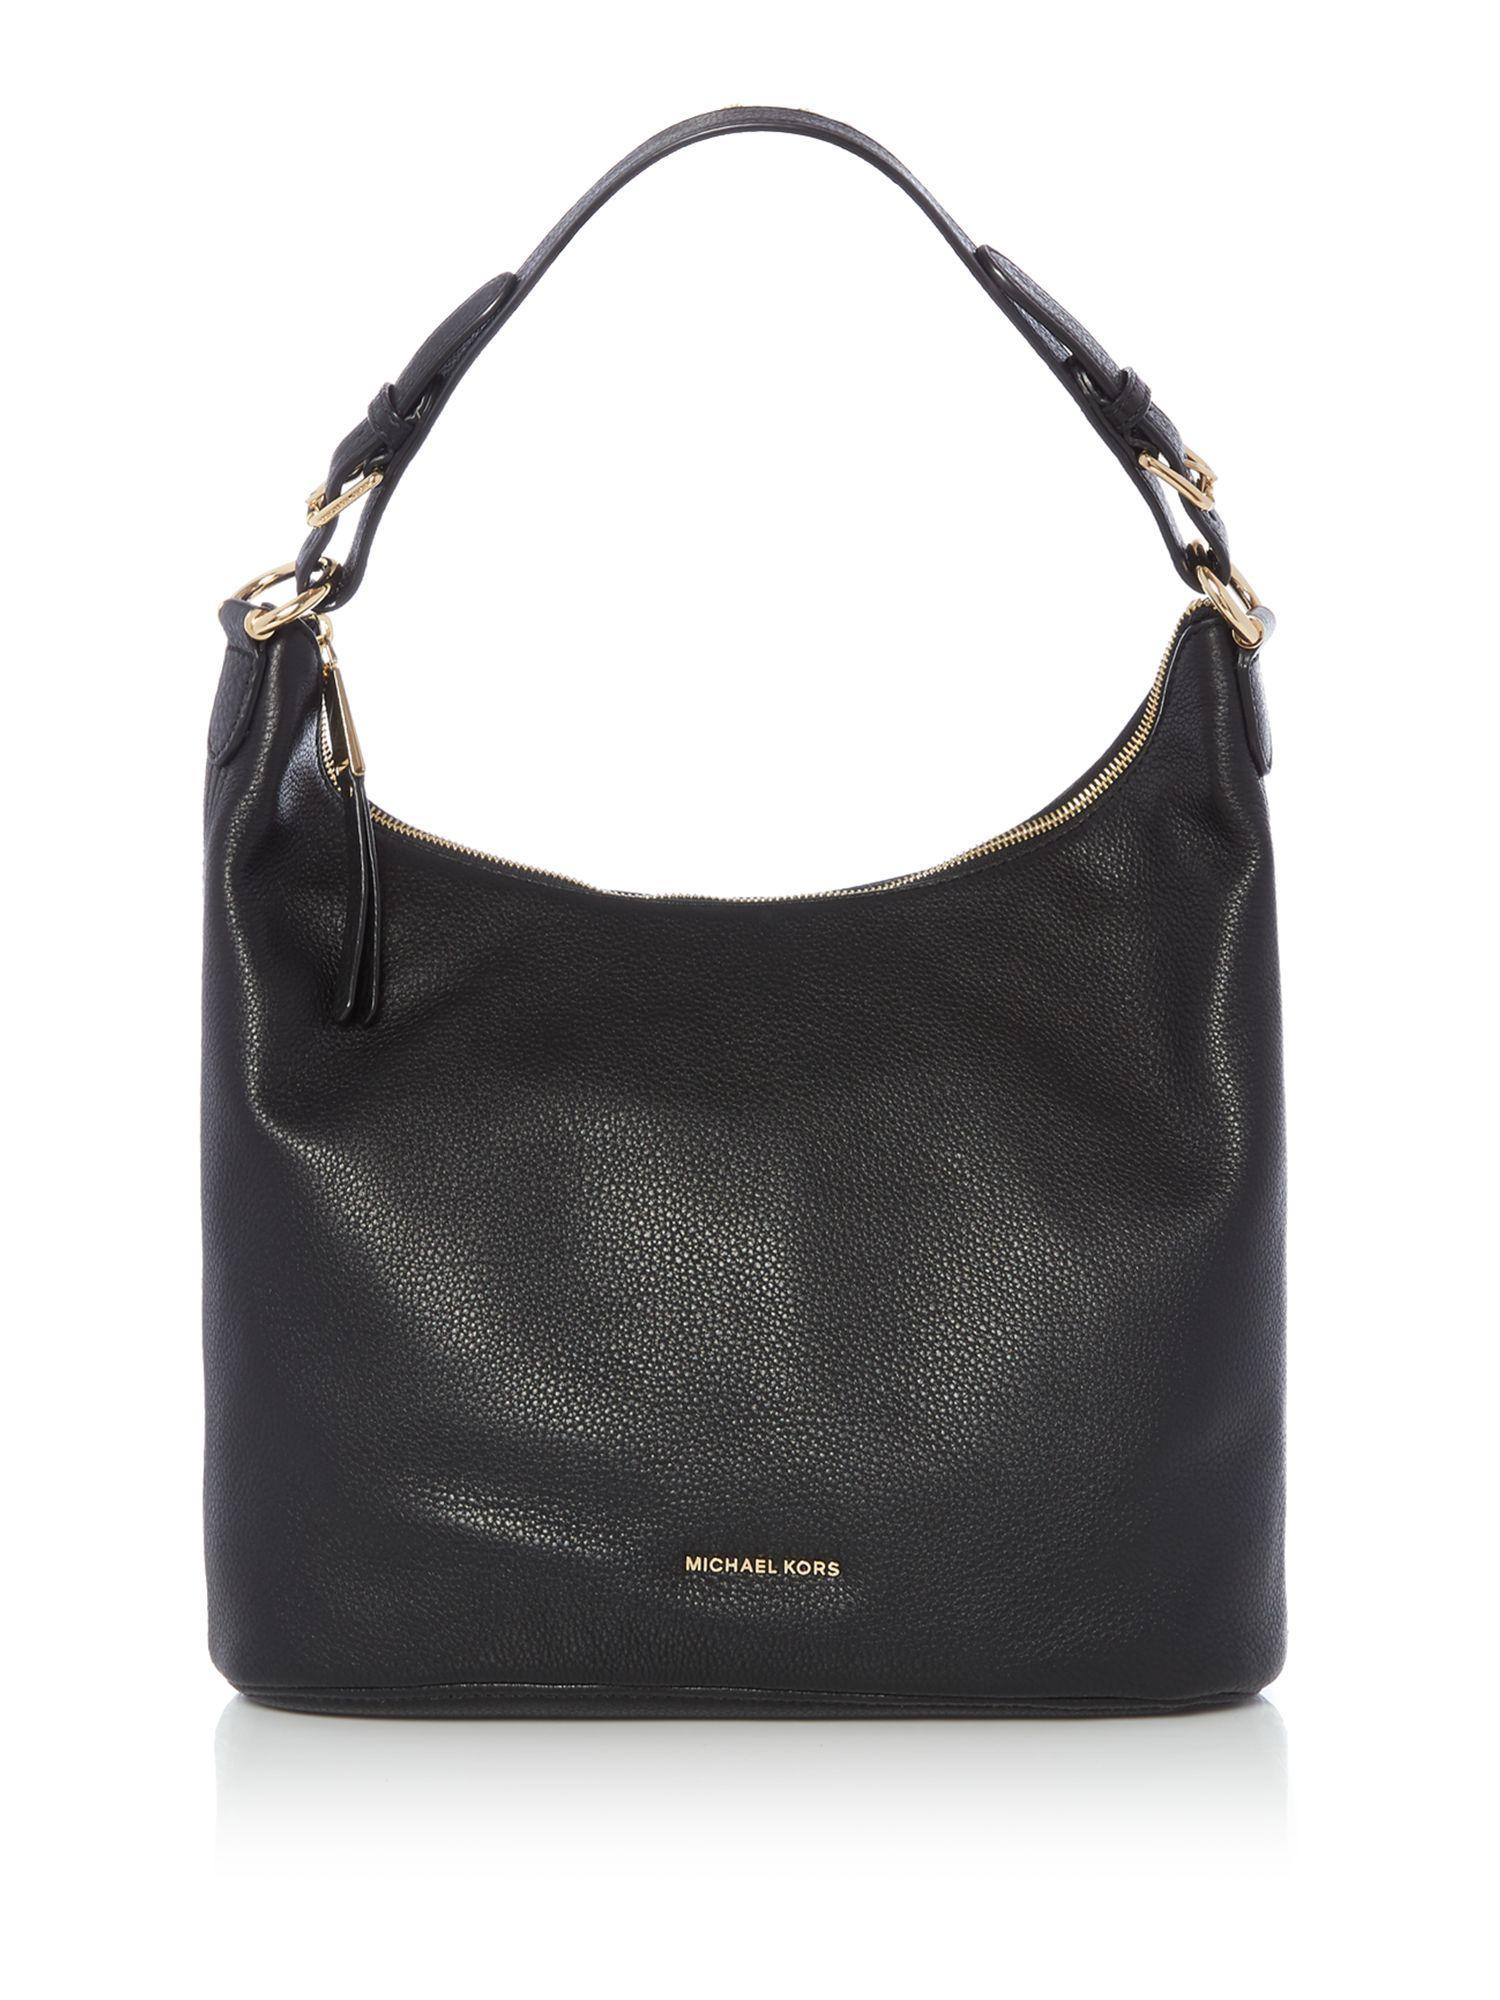 Michael Kors Lupita Black Large Hobo Bag In Black Lyst